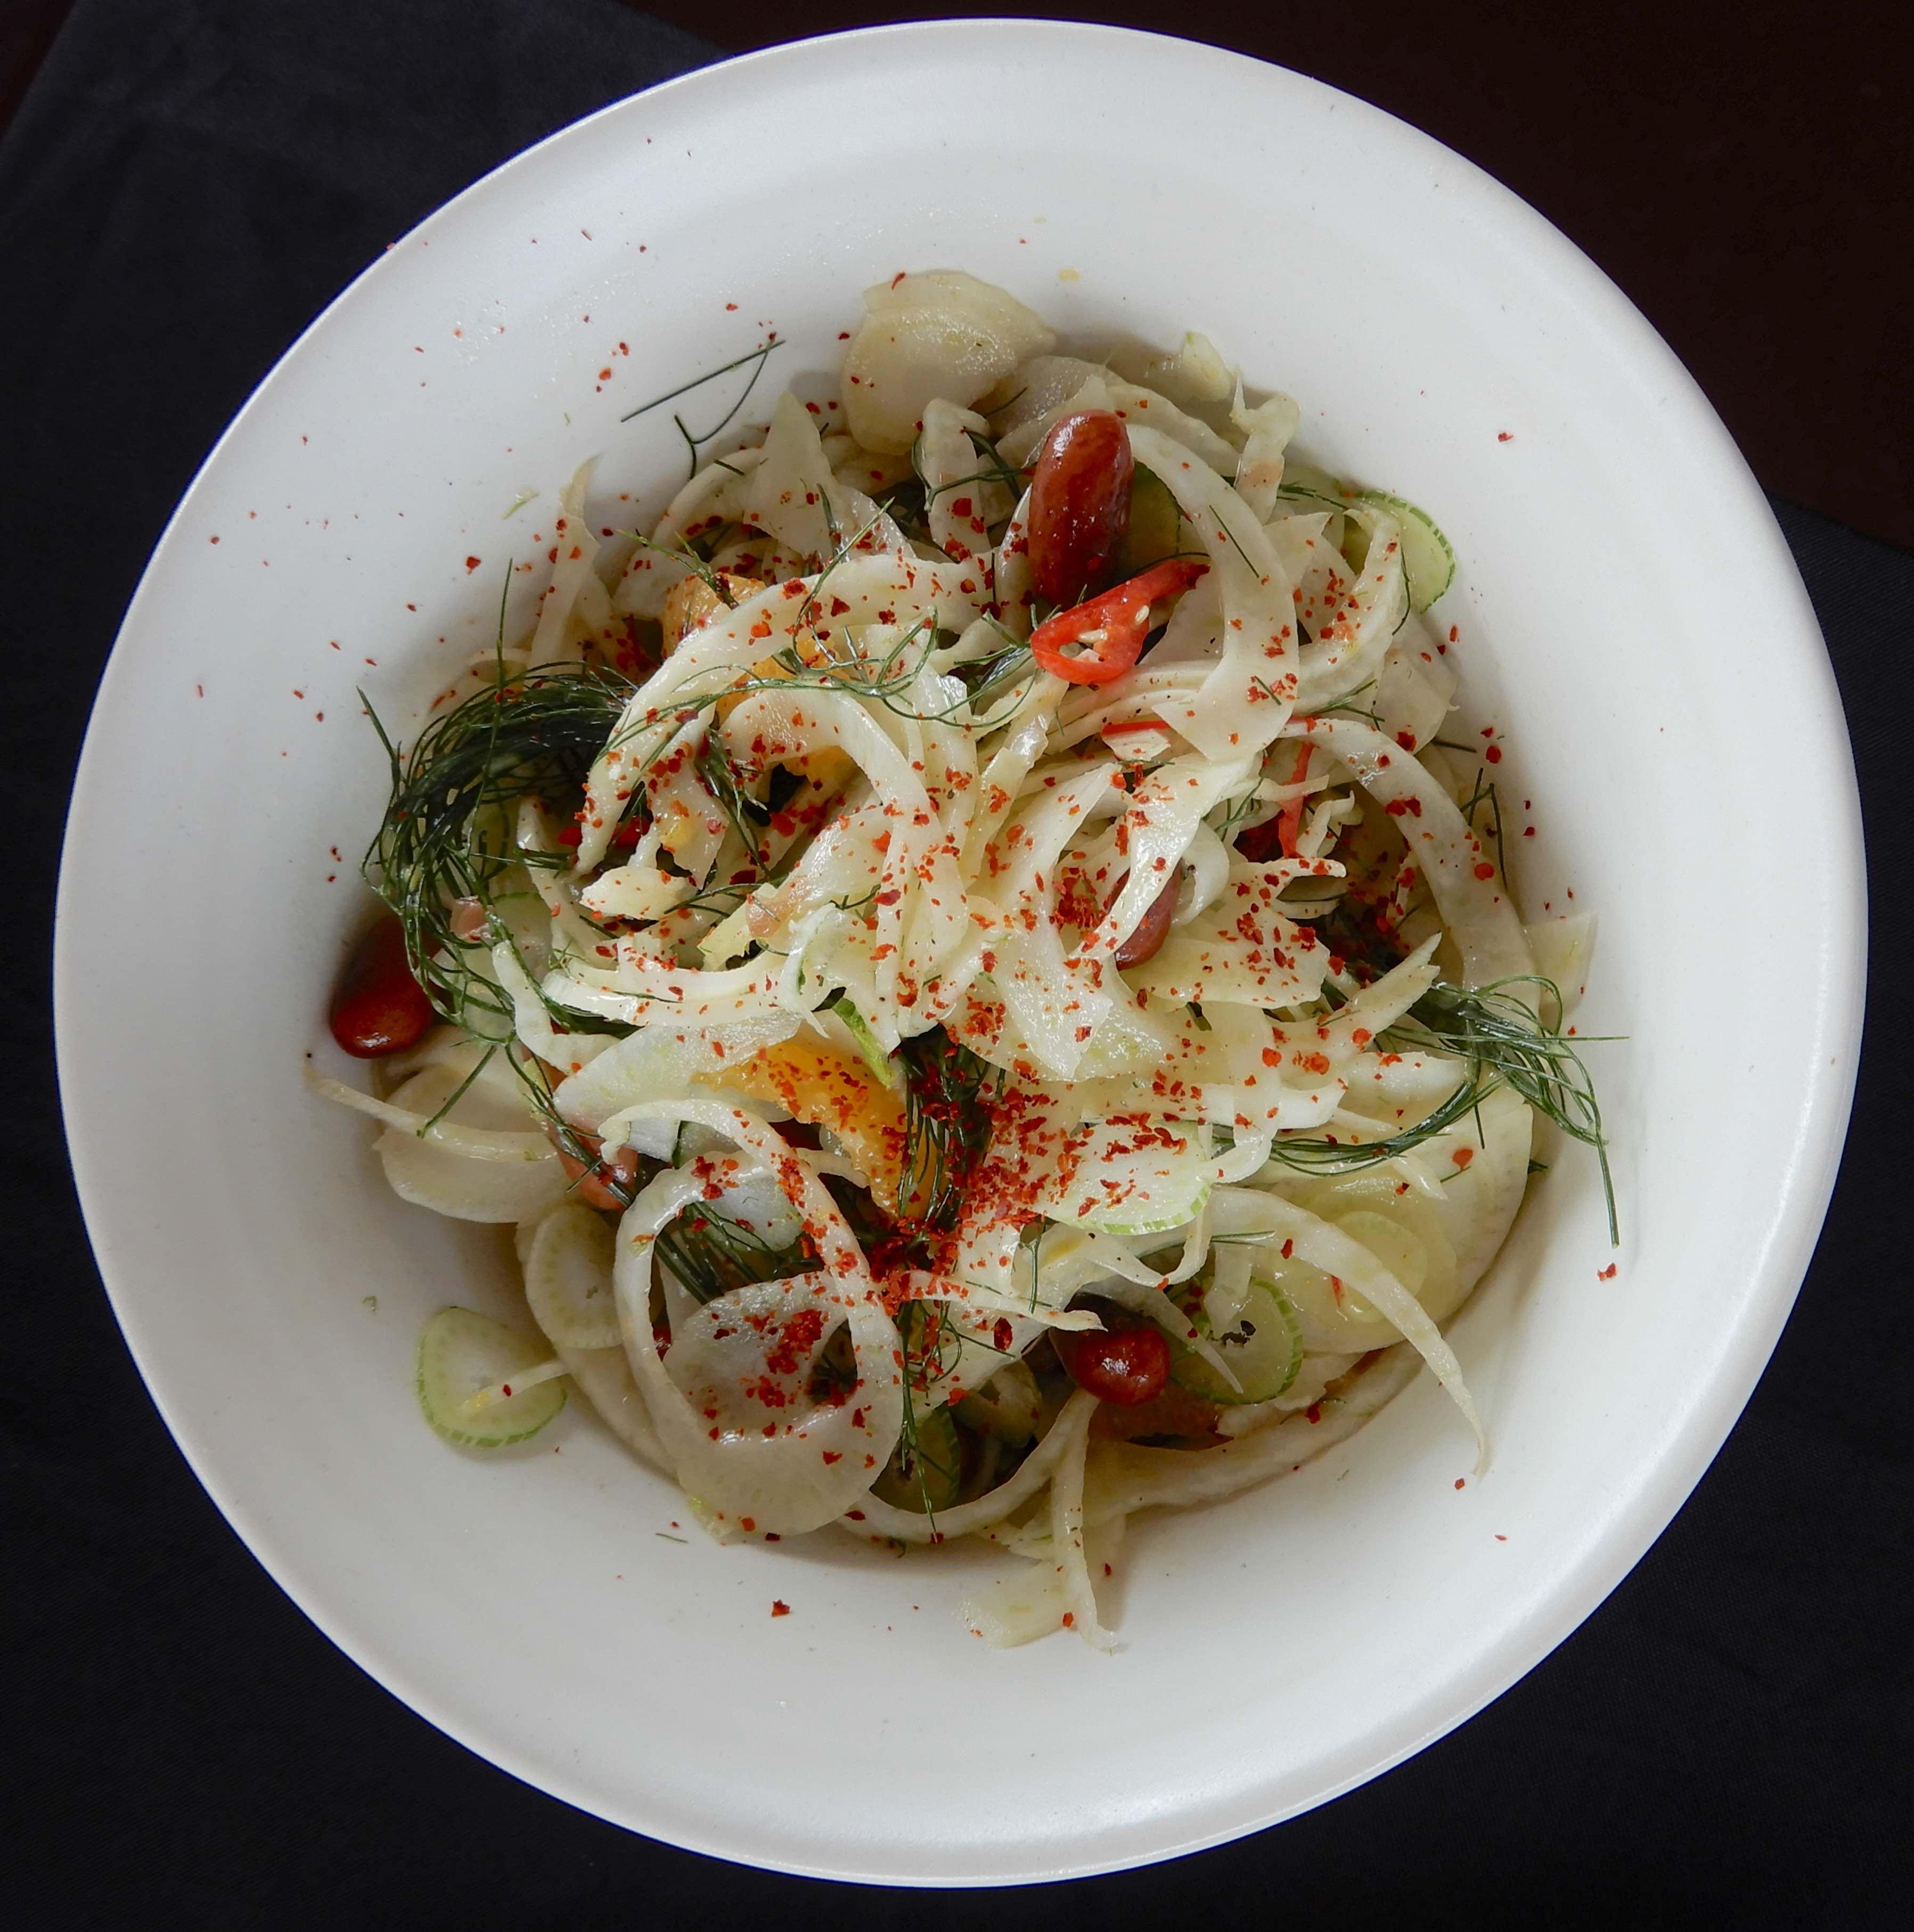 24.salad